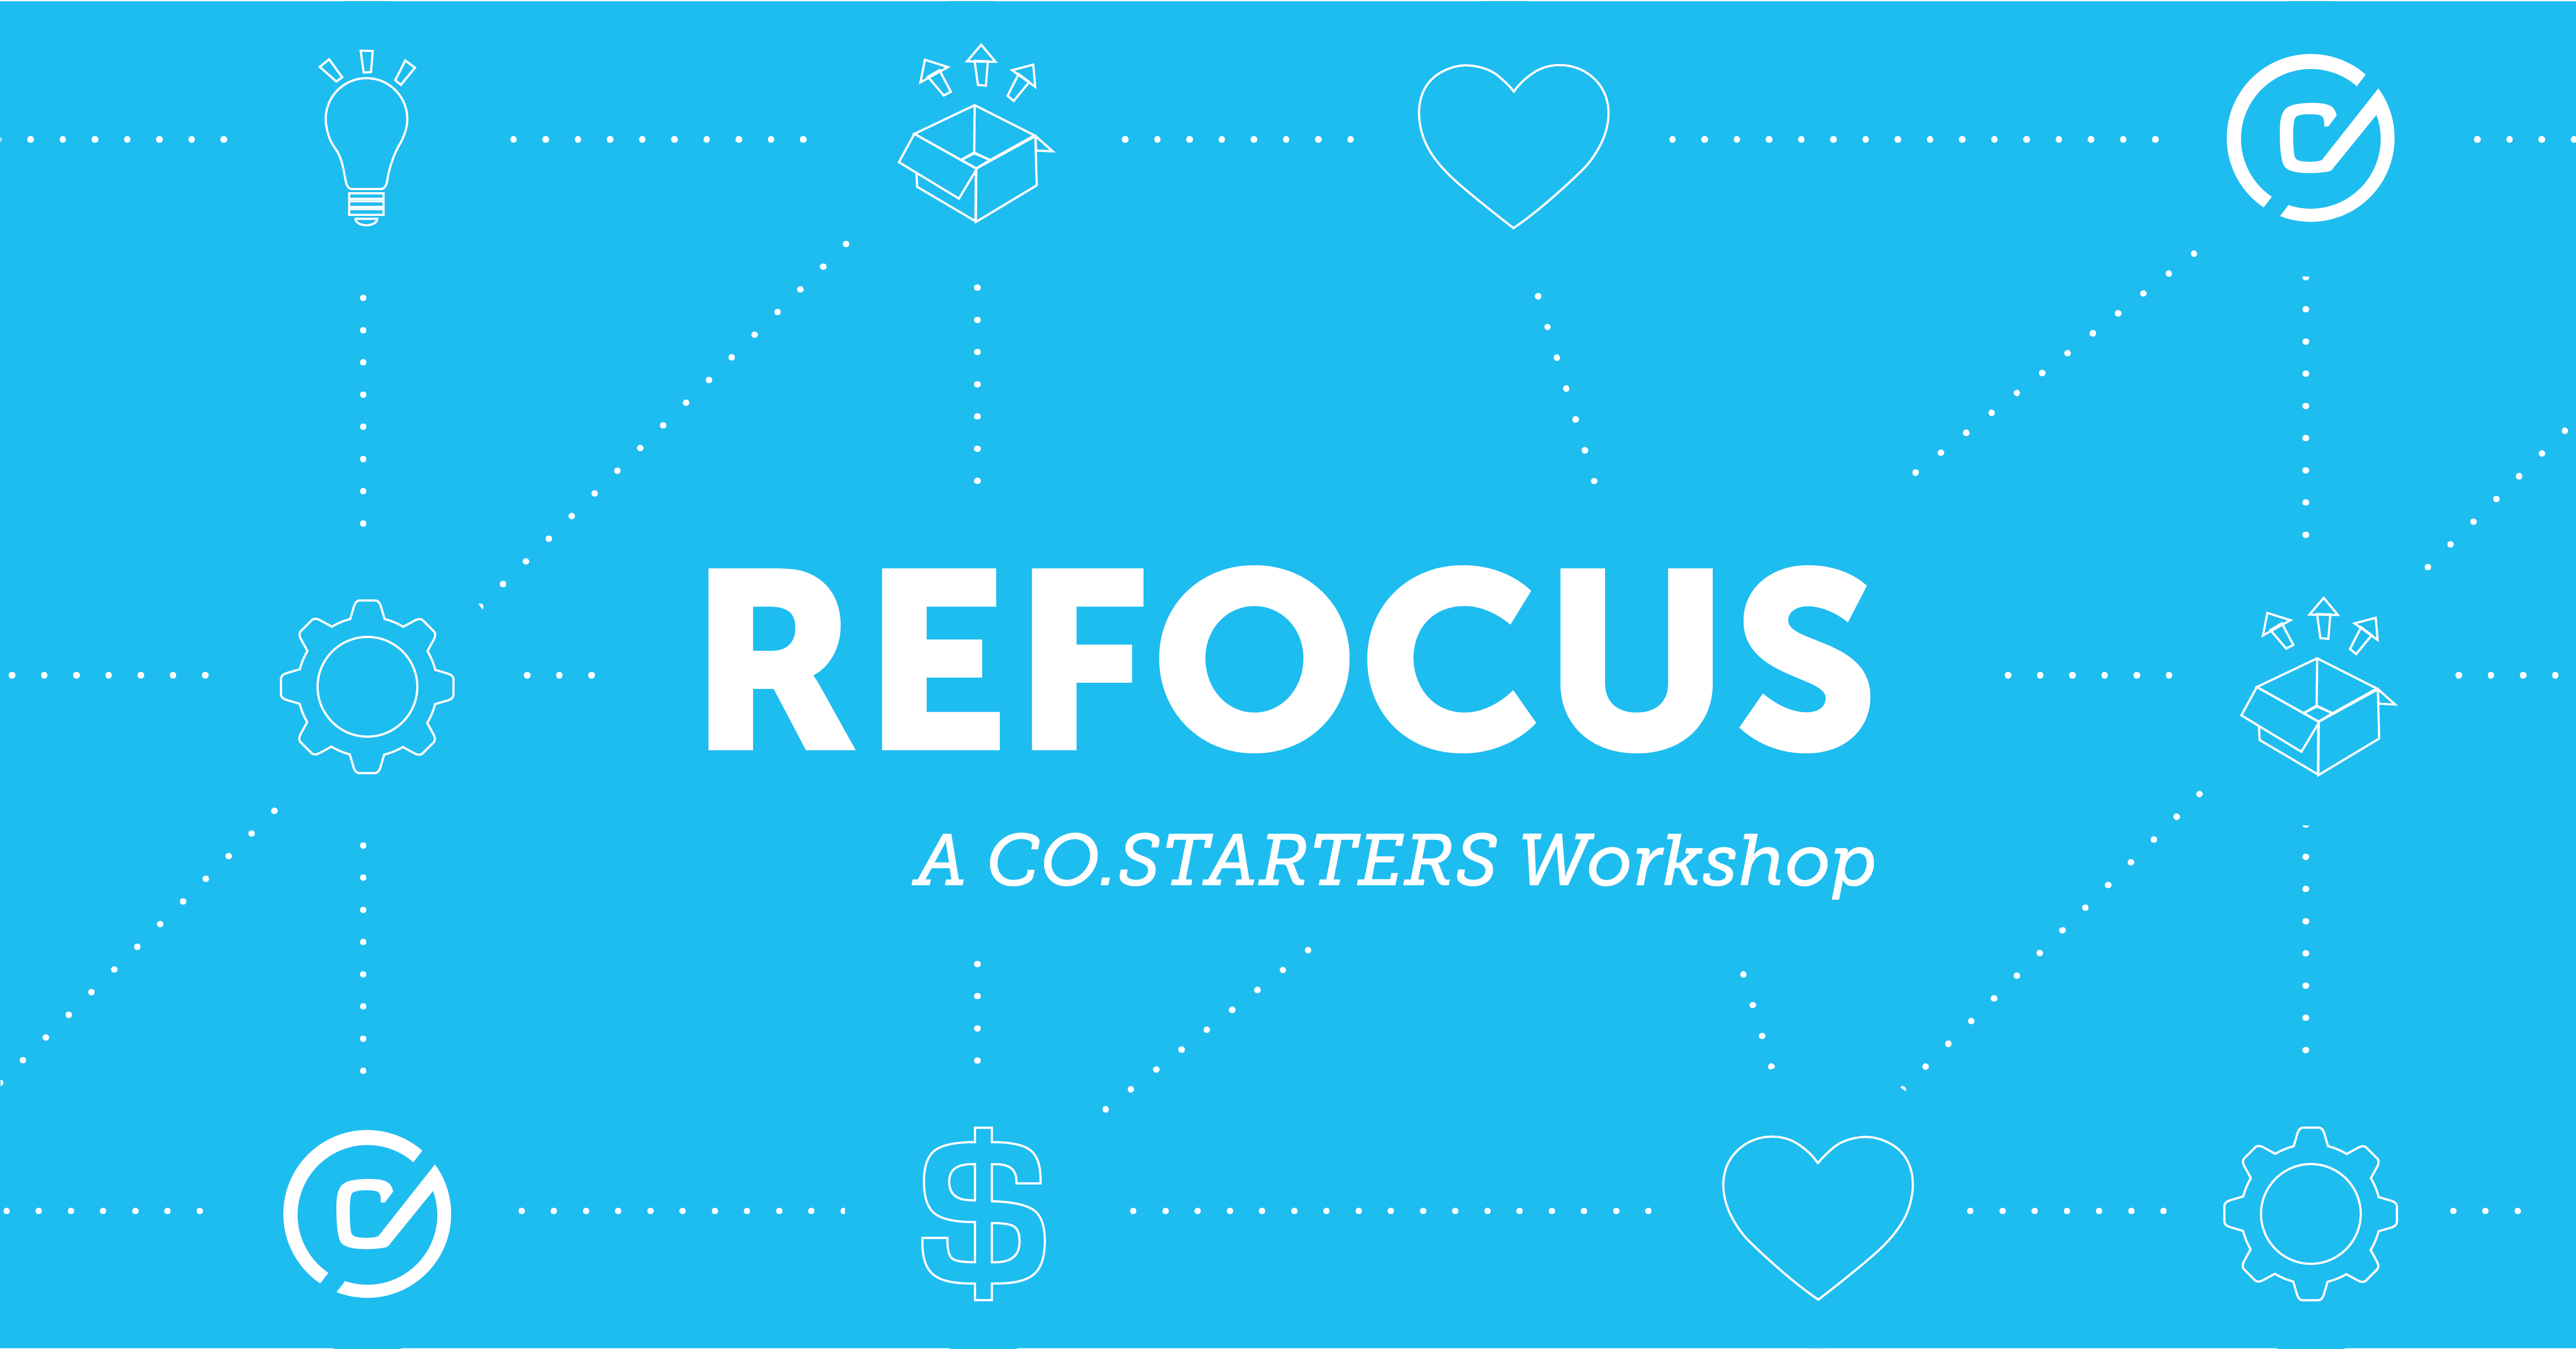 CO. STARTERS Refocus Workshop